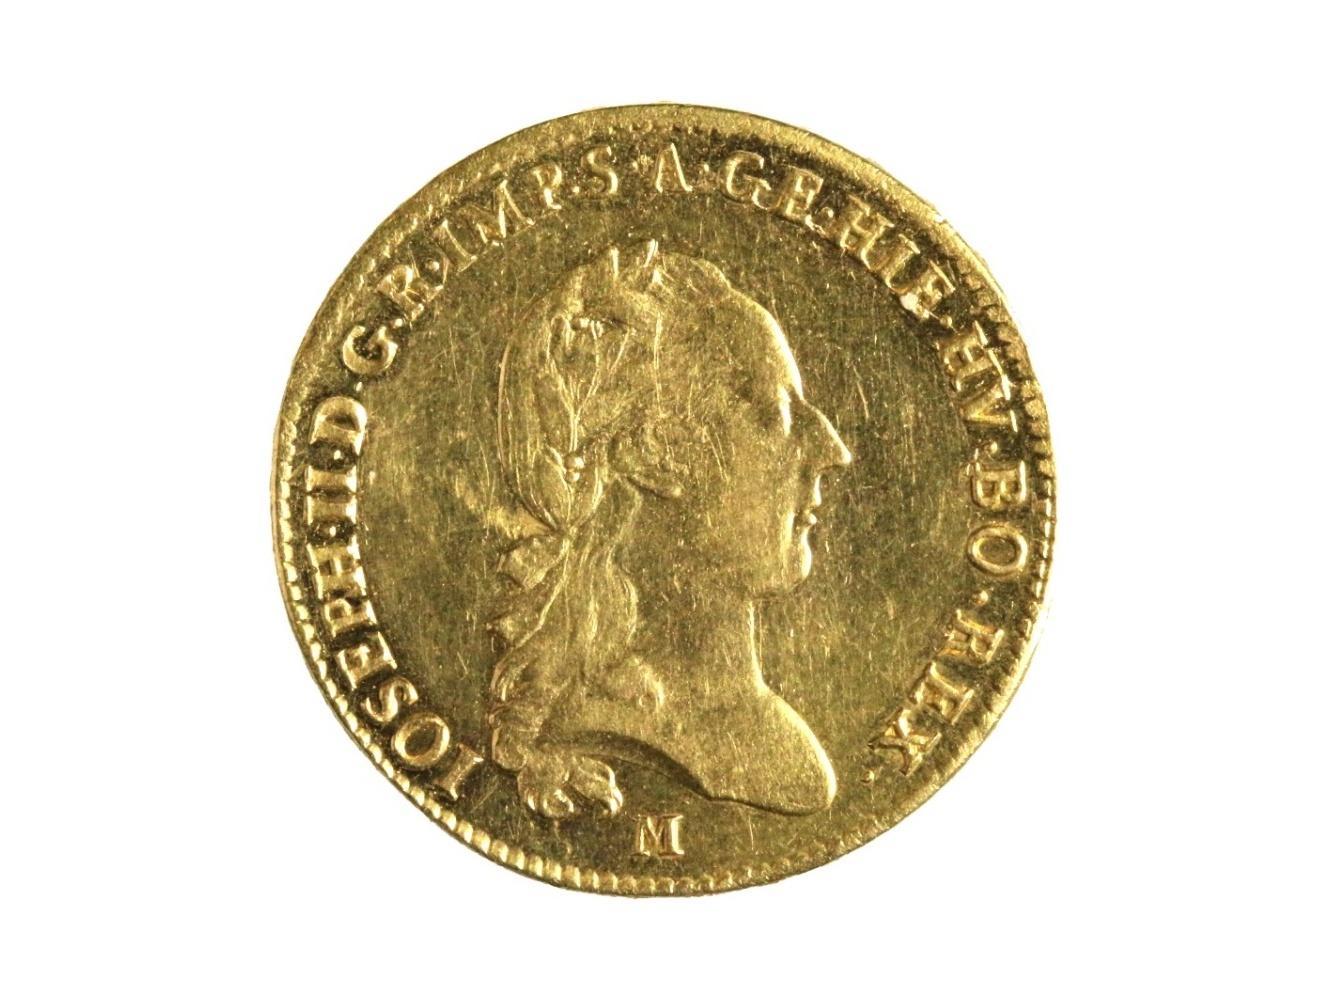 Josef II. 1765-1790 - Sovráno 1788 M Milano, N 61, nepatrně just.